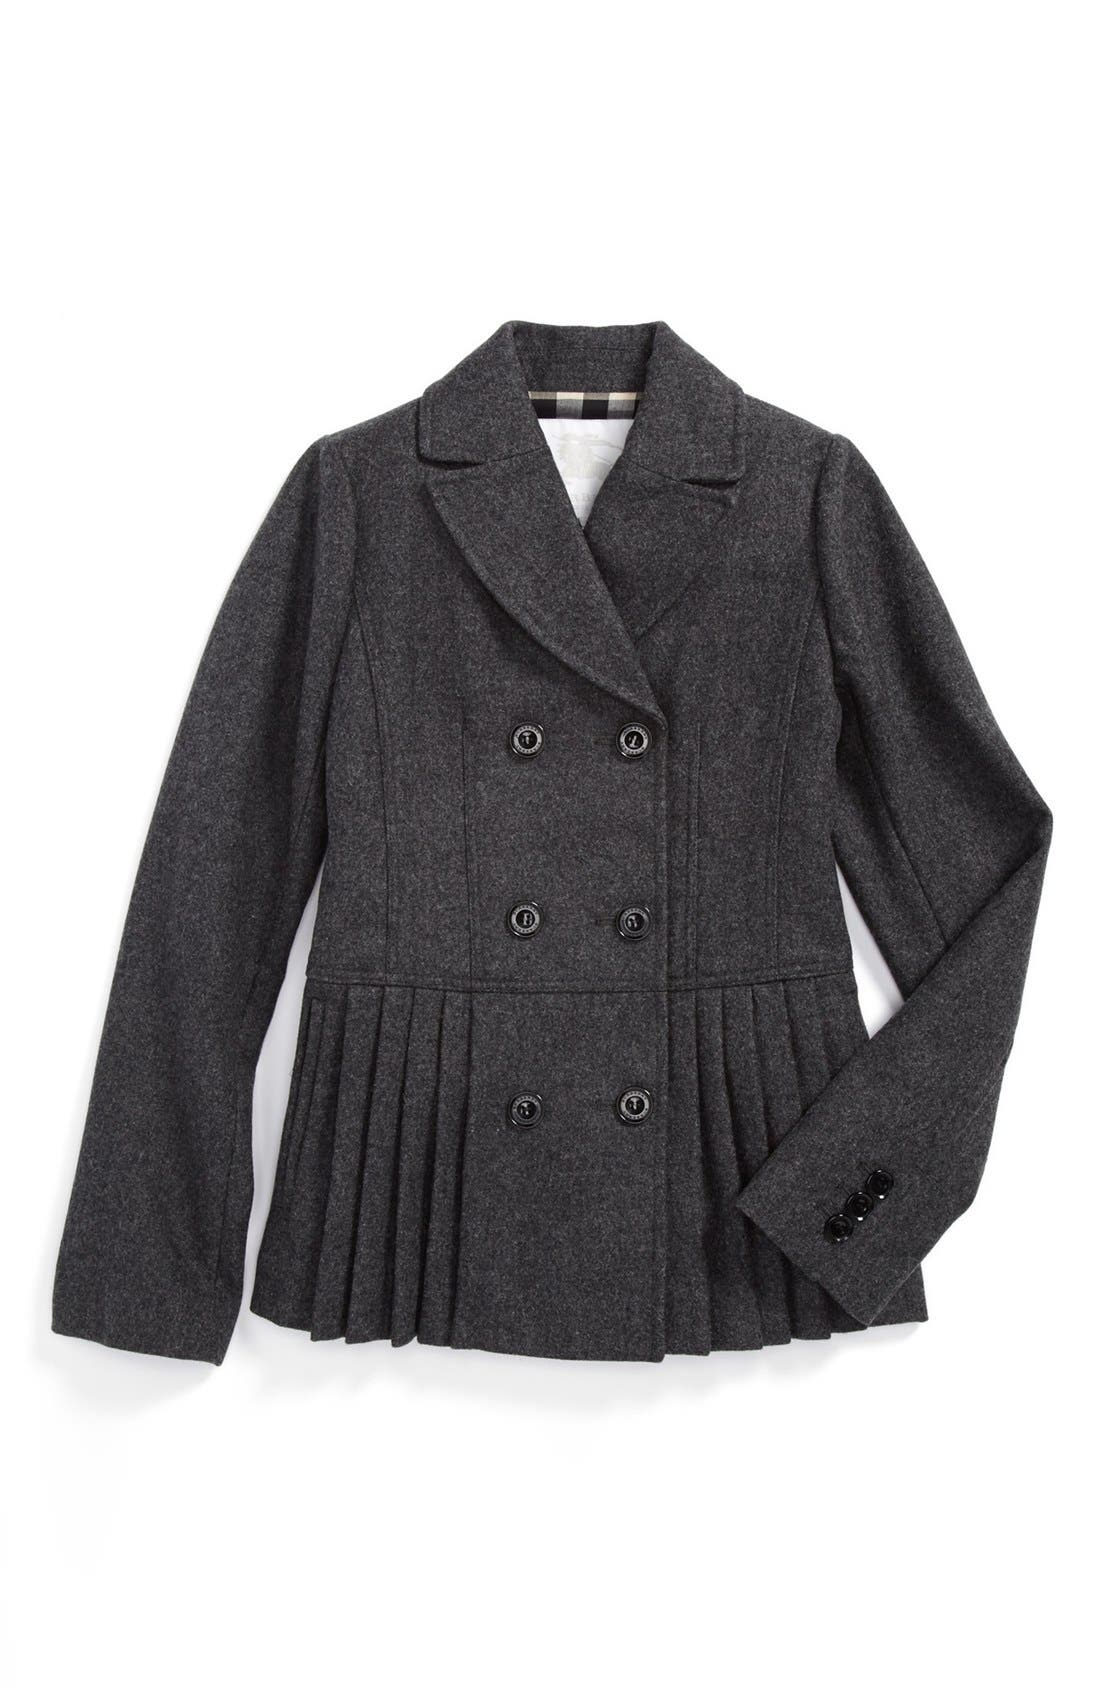 Alternate Image 1 Selected - Burberry Tailored Jacket (Little Girls & Big Girls)